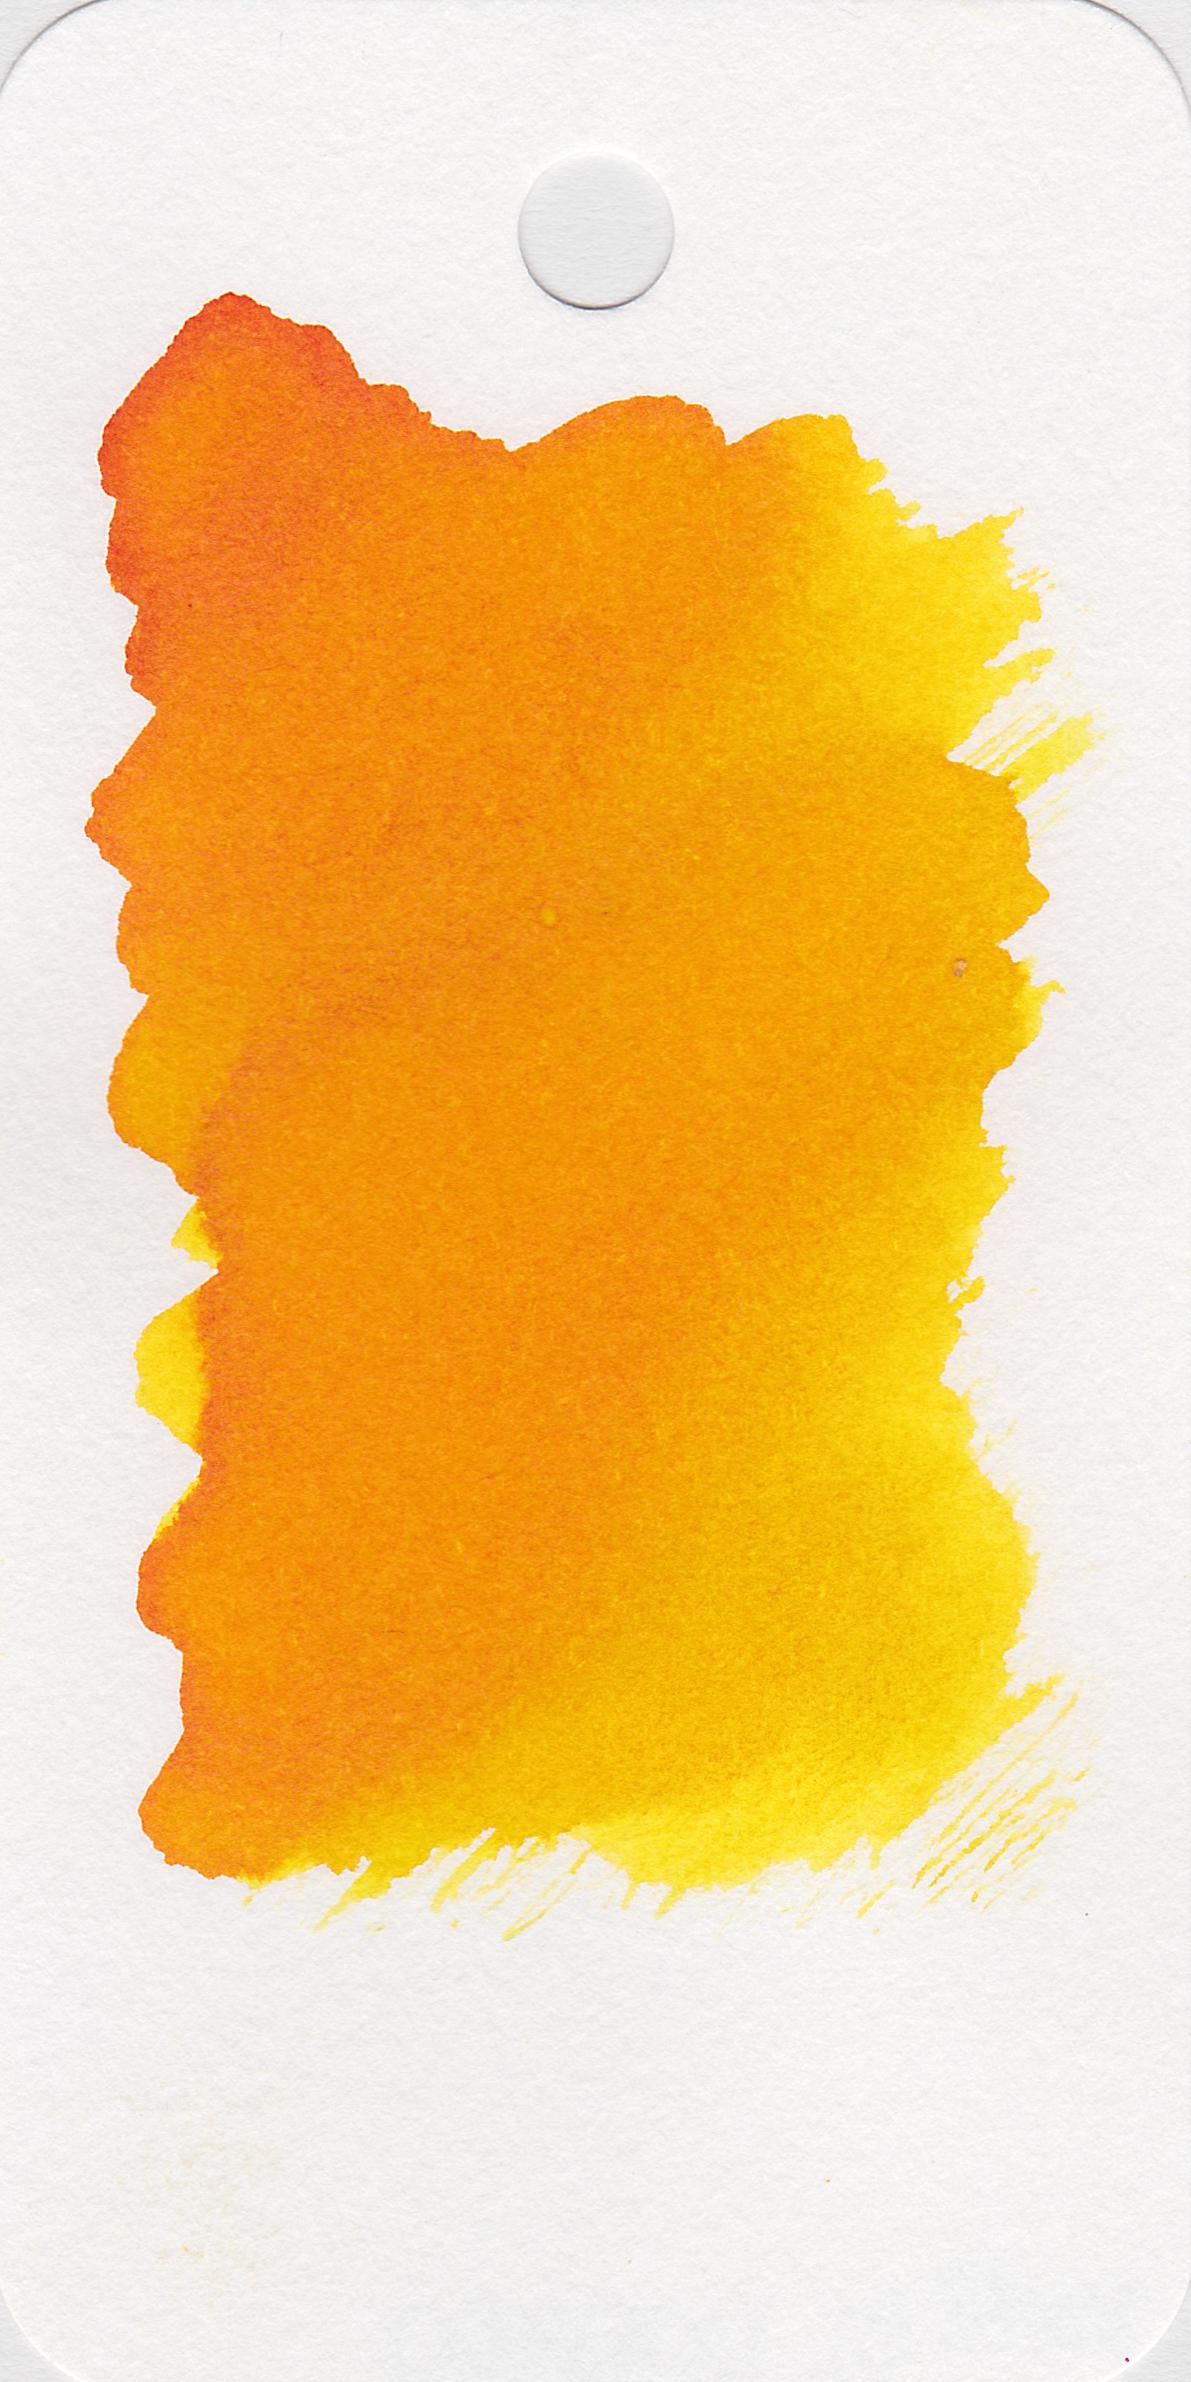 kwz-old-gold-2.jpg